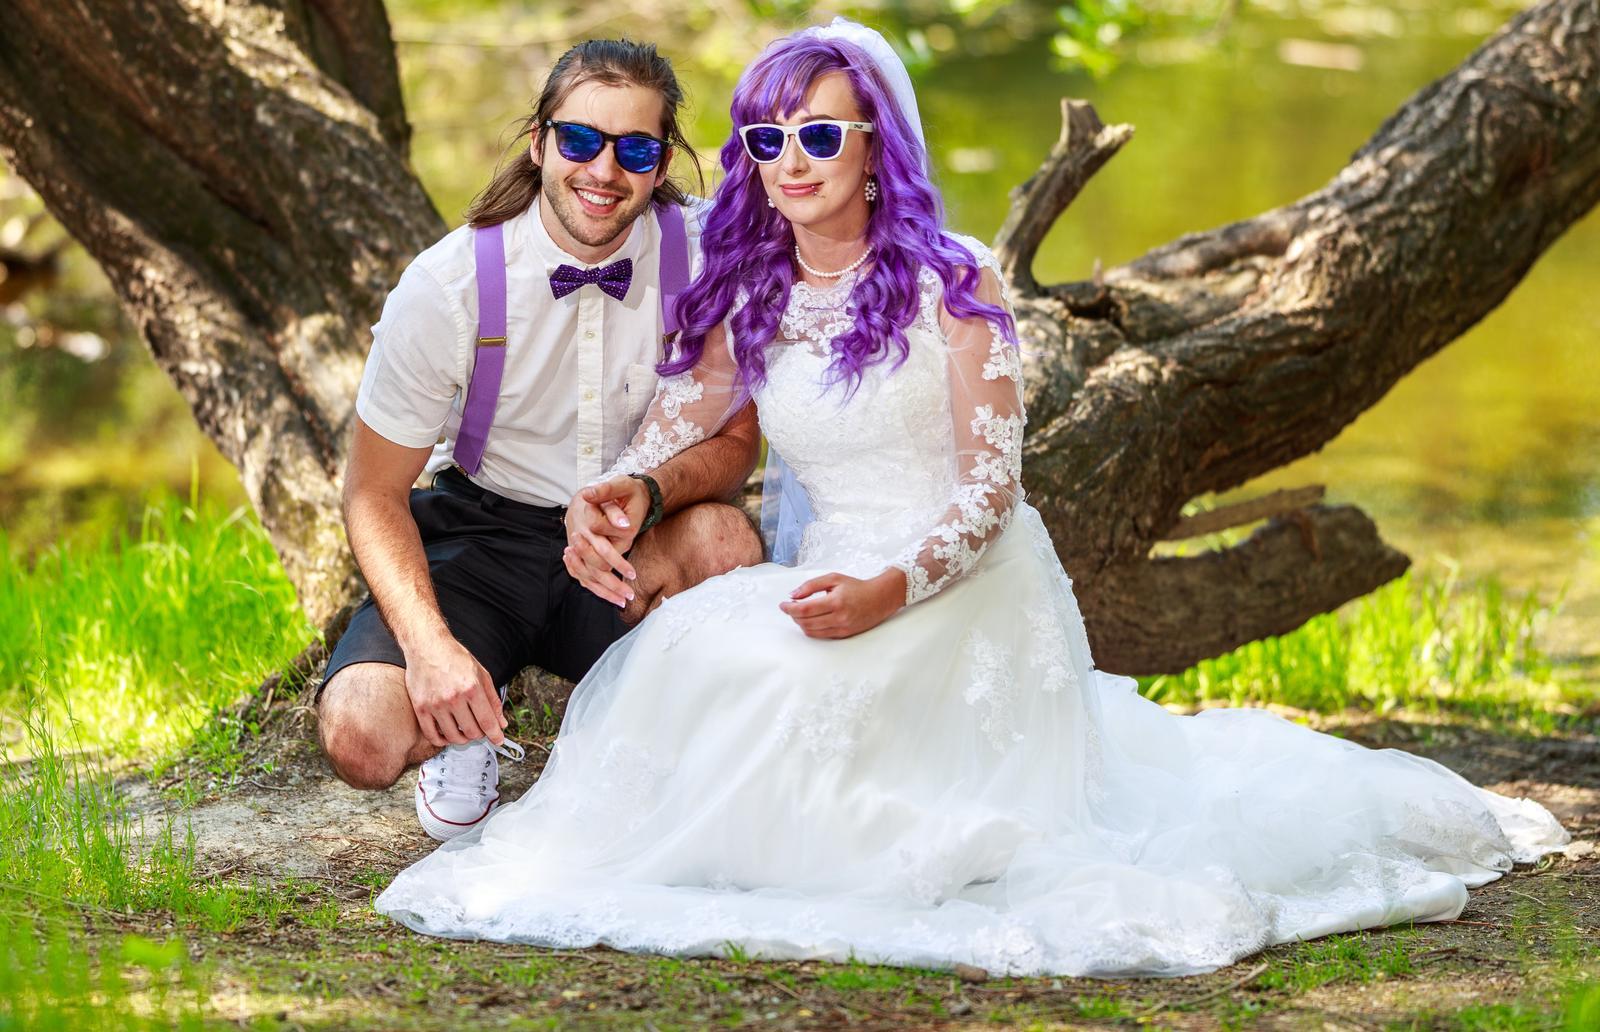 Nadherne svadobne saty - Obrázok č. 2